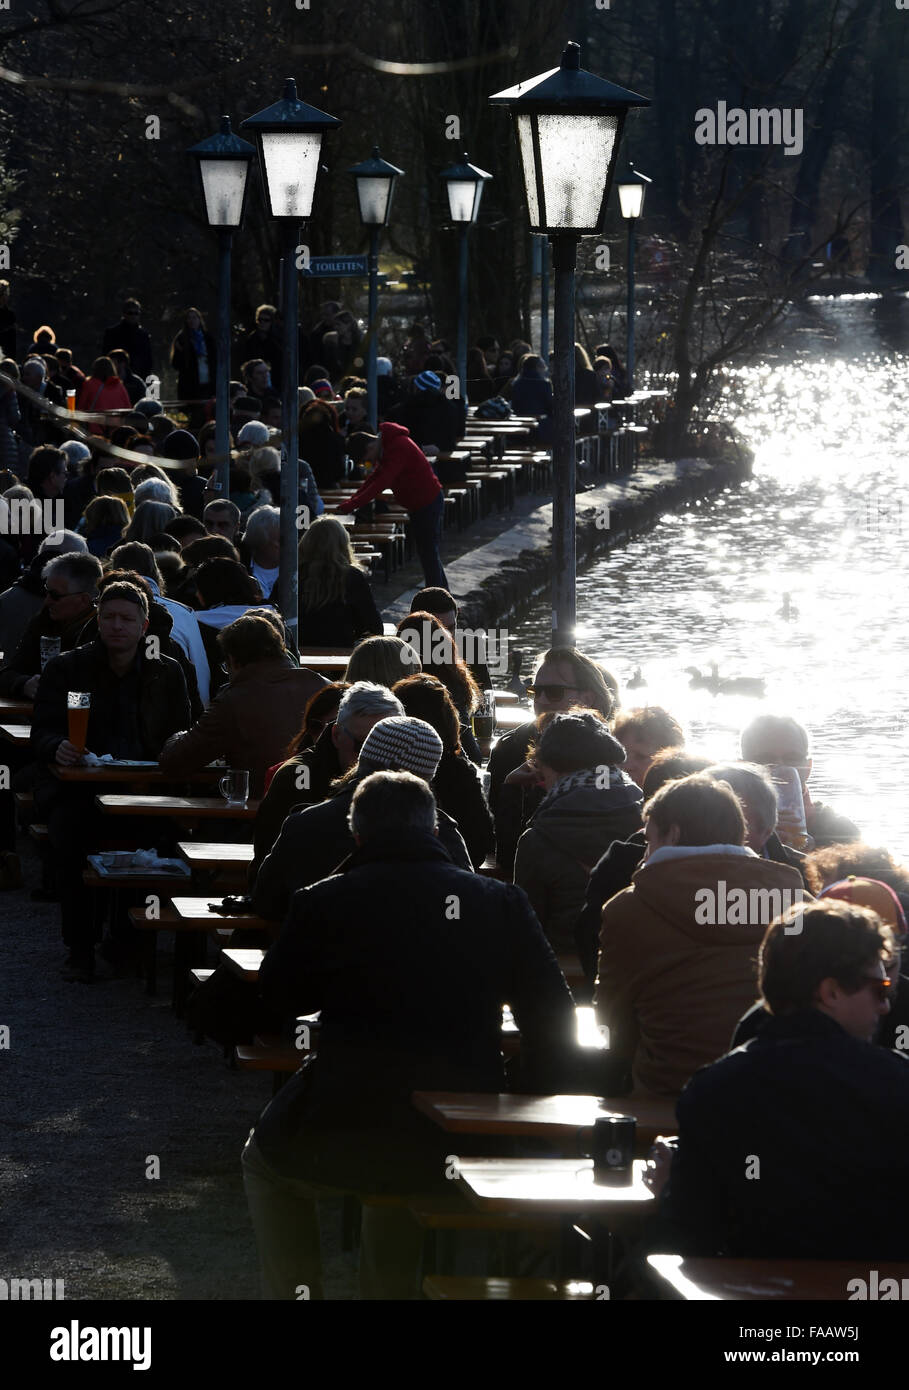 Munich, Germany. 25th Dec, 2015. People sit in the beer garden in the 'Englische Garten' park in Munich, - Stock Image